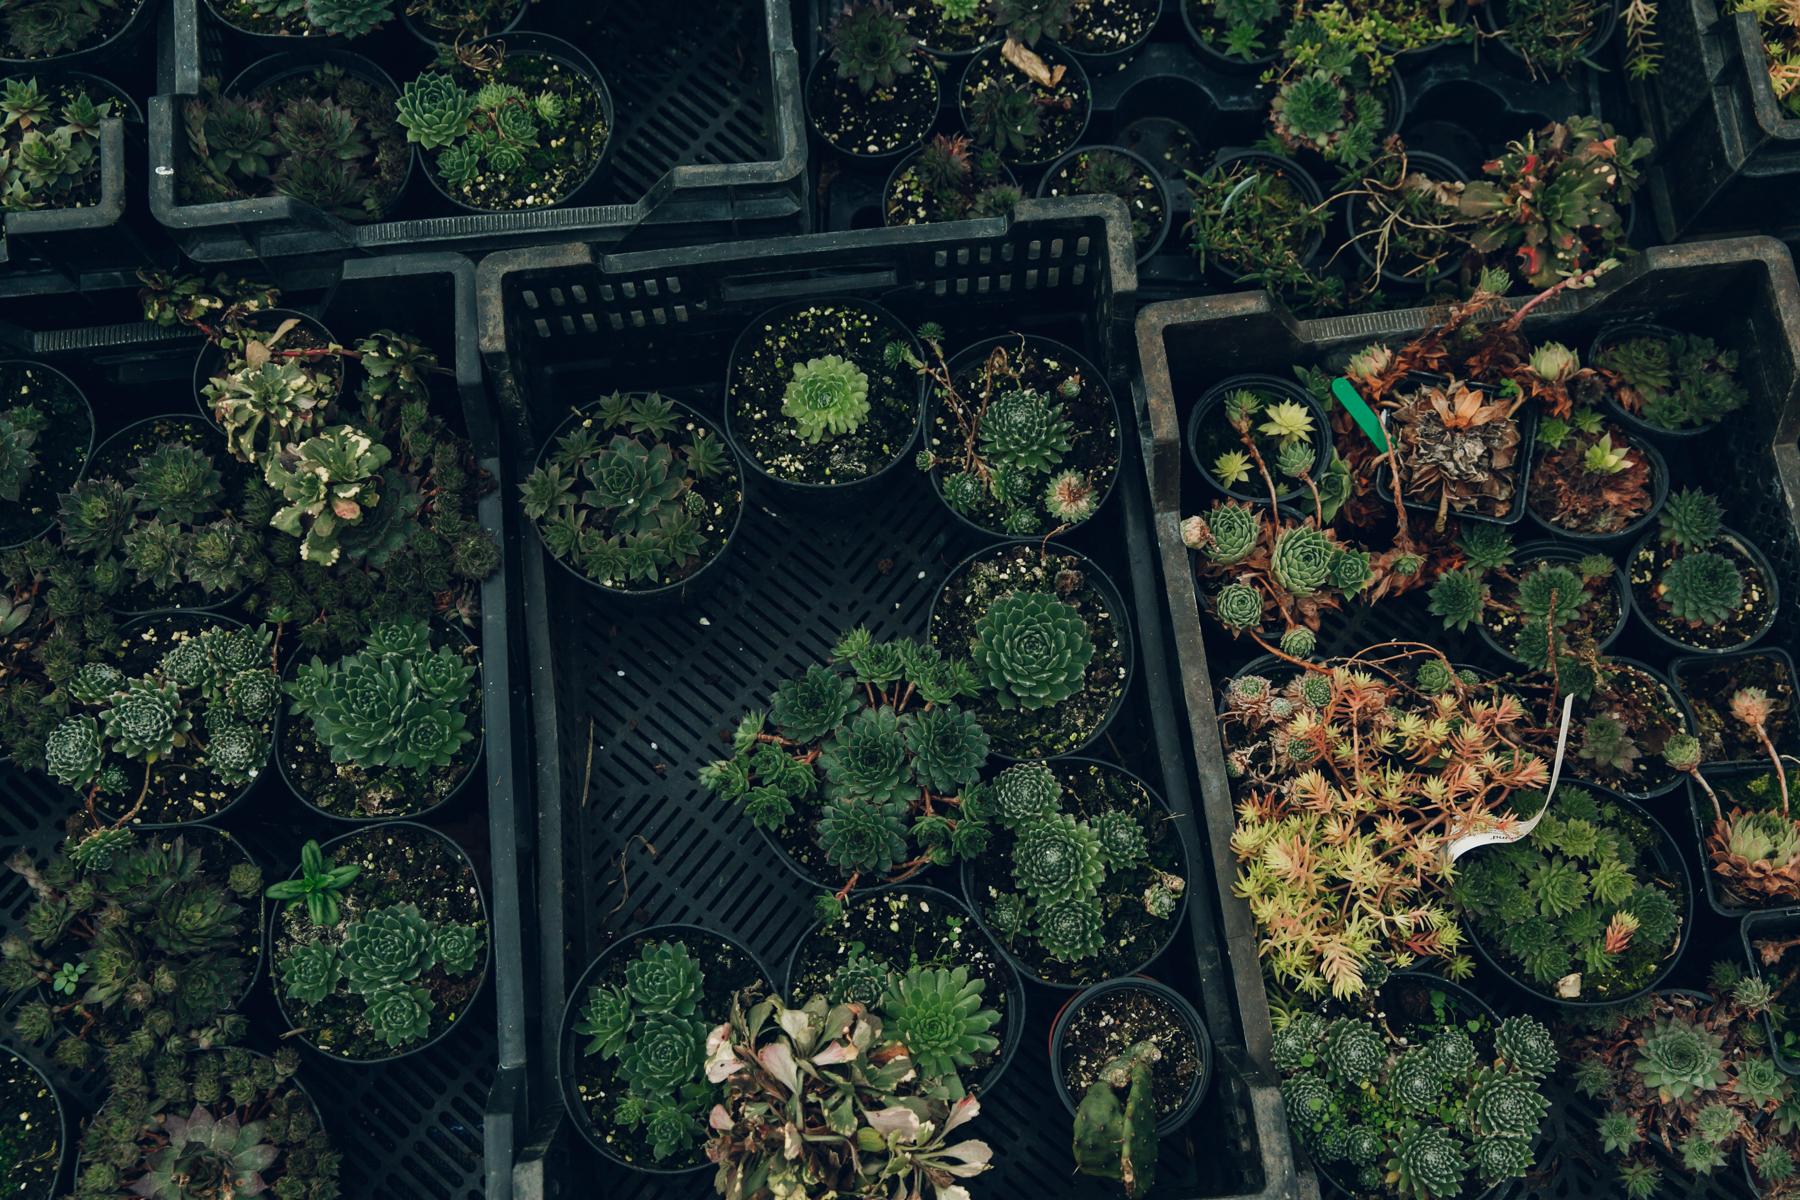 Sempervivum in the greenhouse.